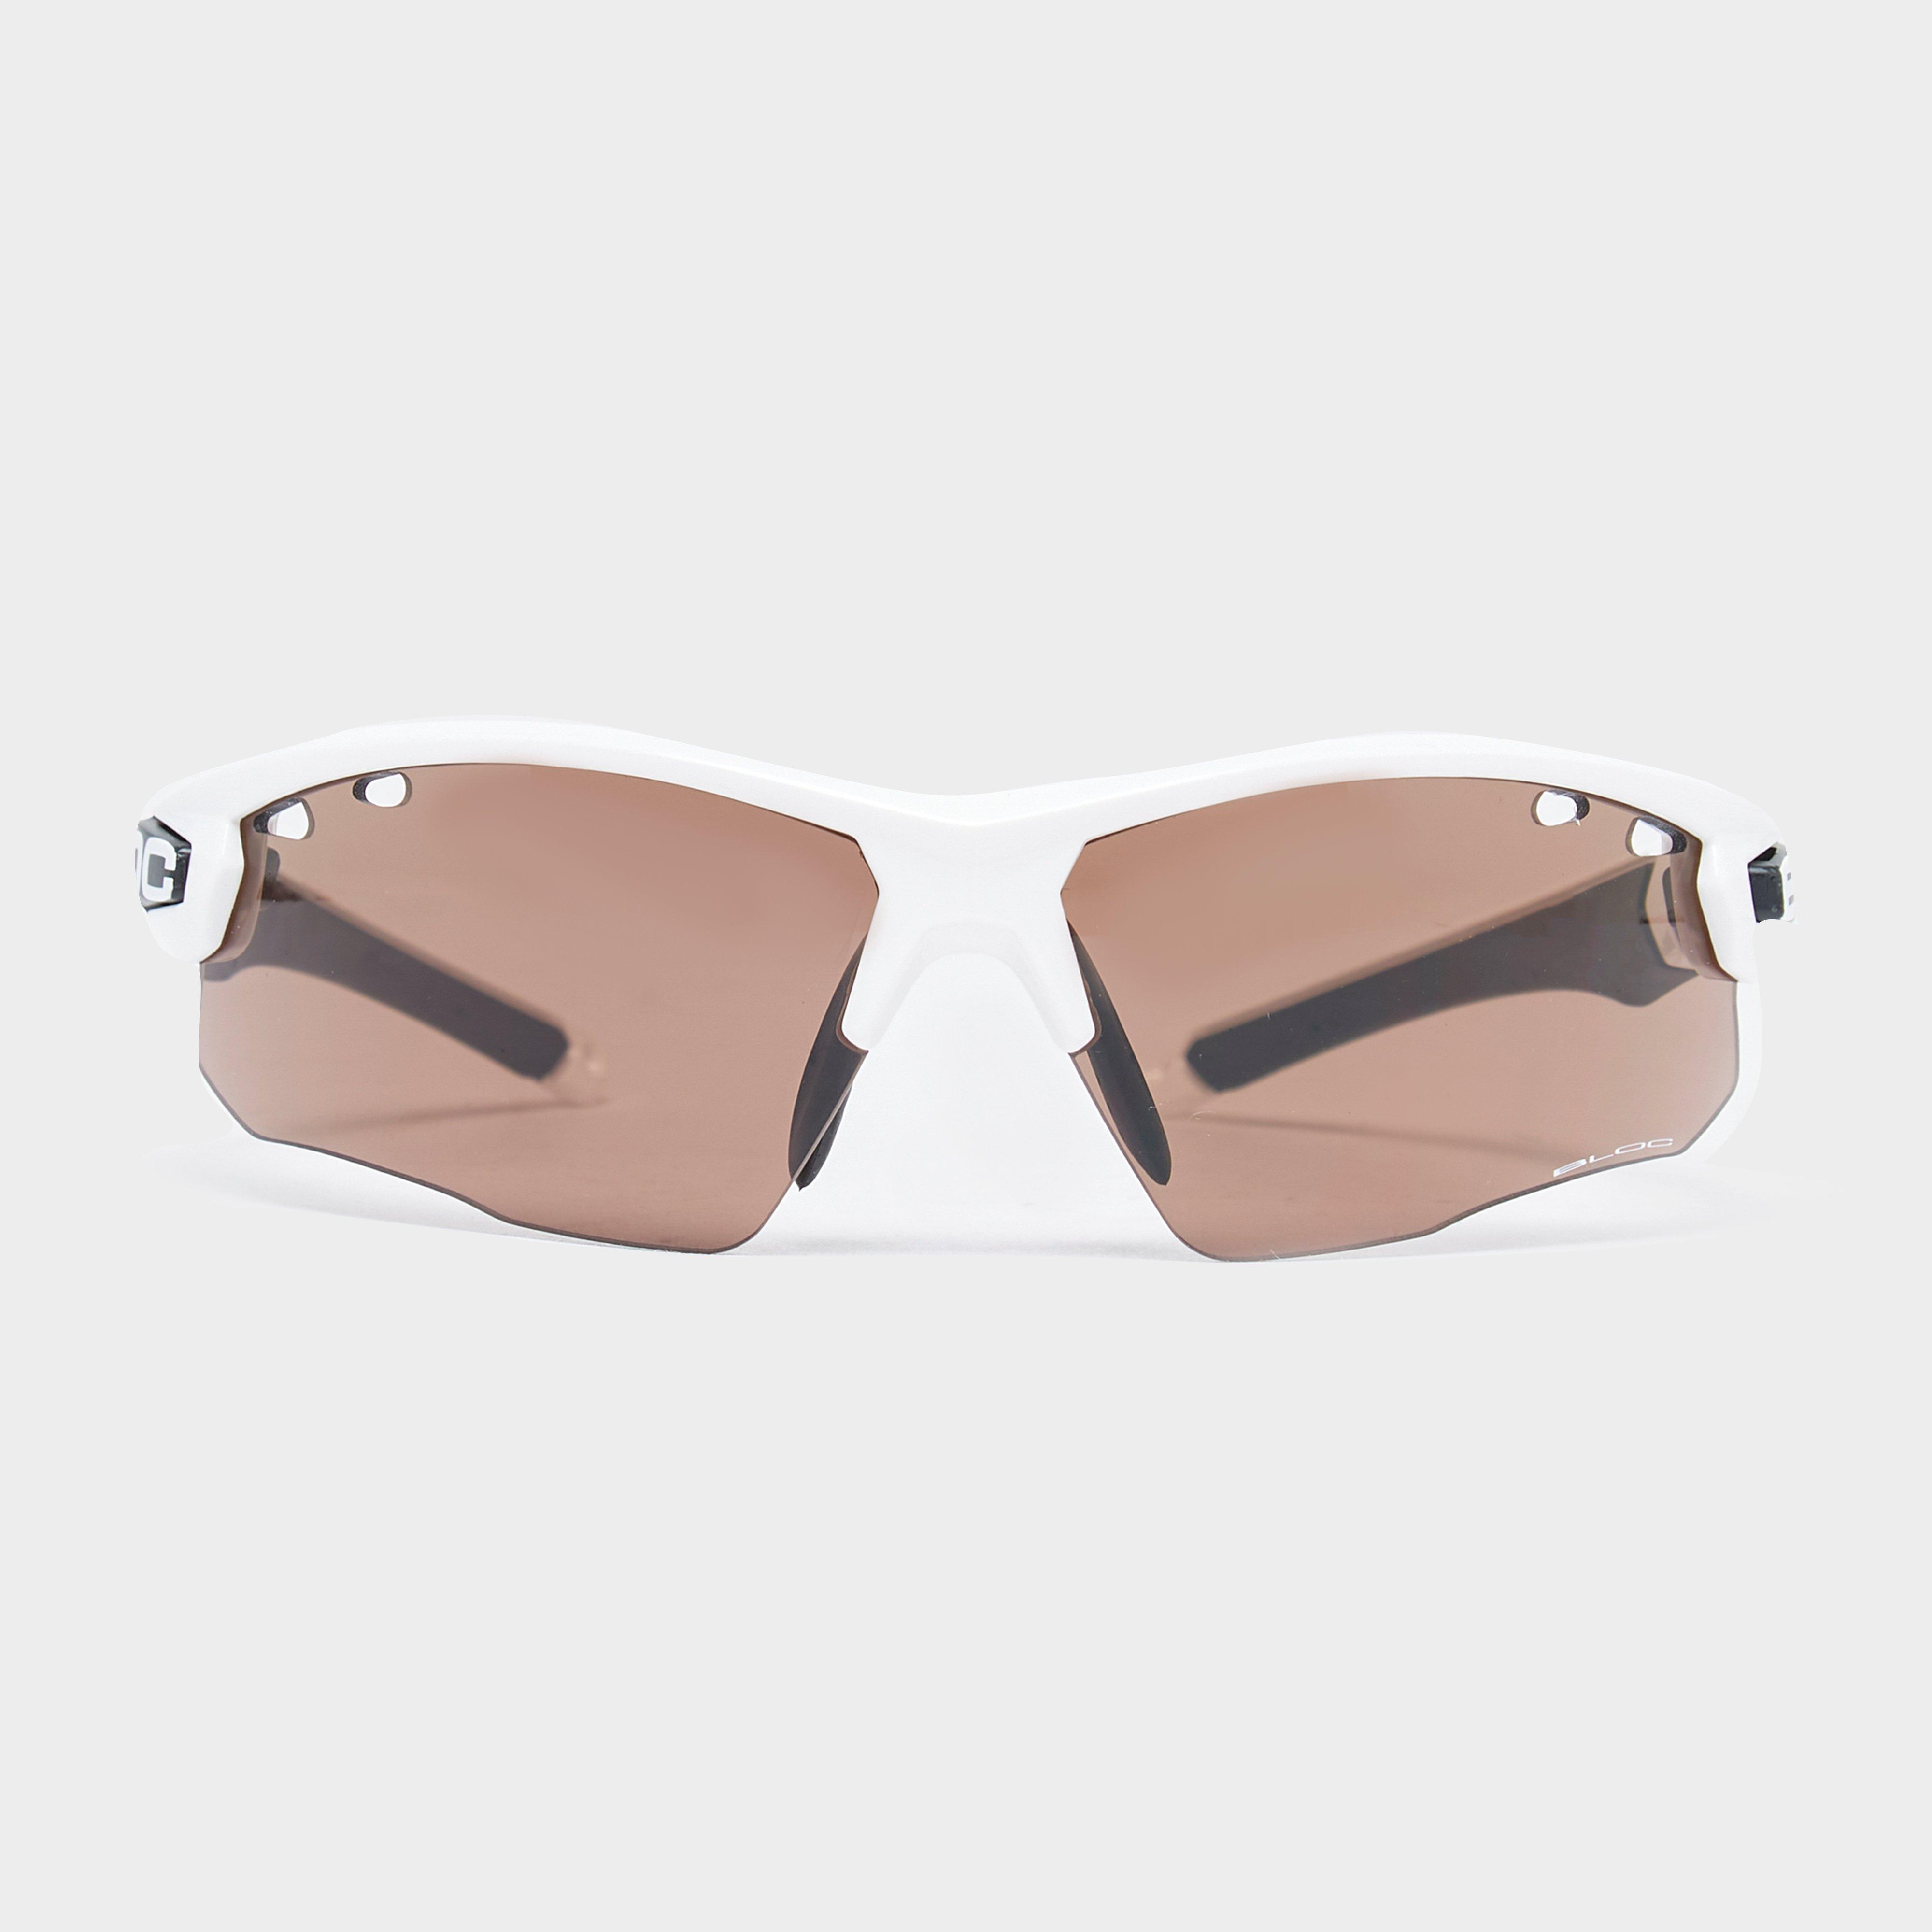 Bloc Titan Xr630 Sunglasses - White/wht/multi  White/wht/multi